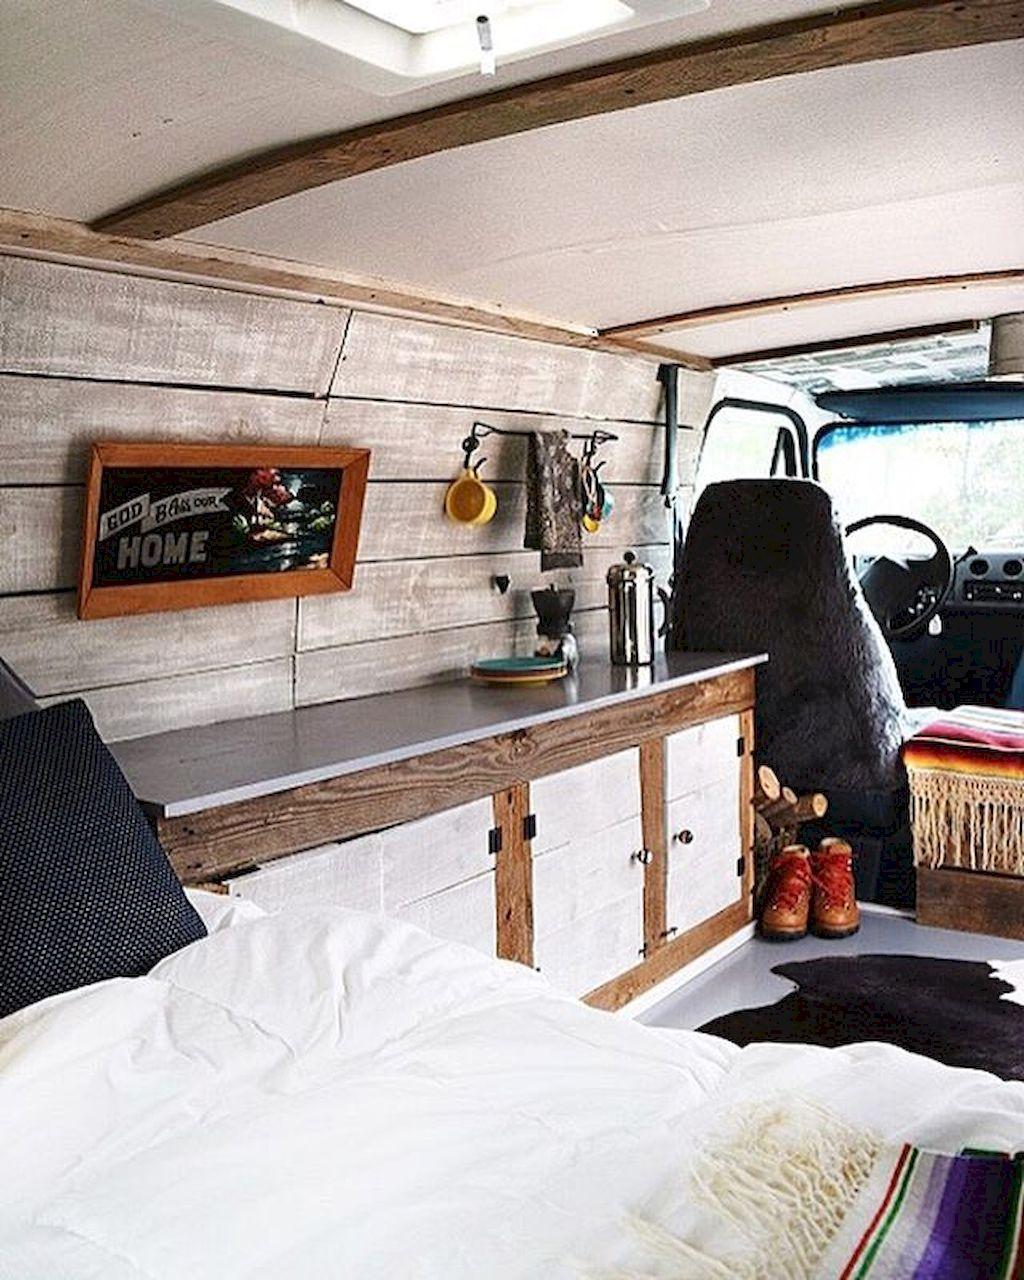 Camper Van Interior Design And Organization Ideas (68